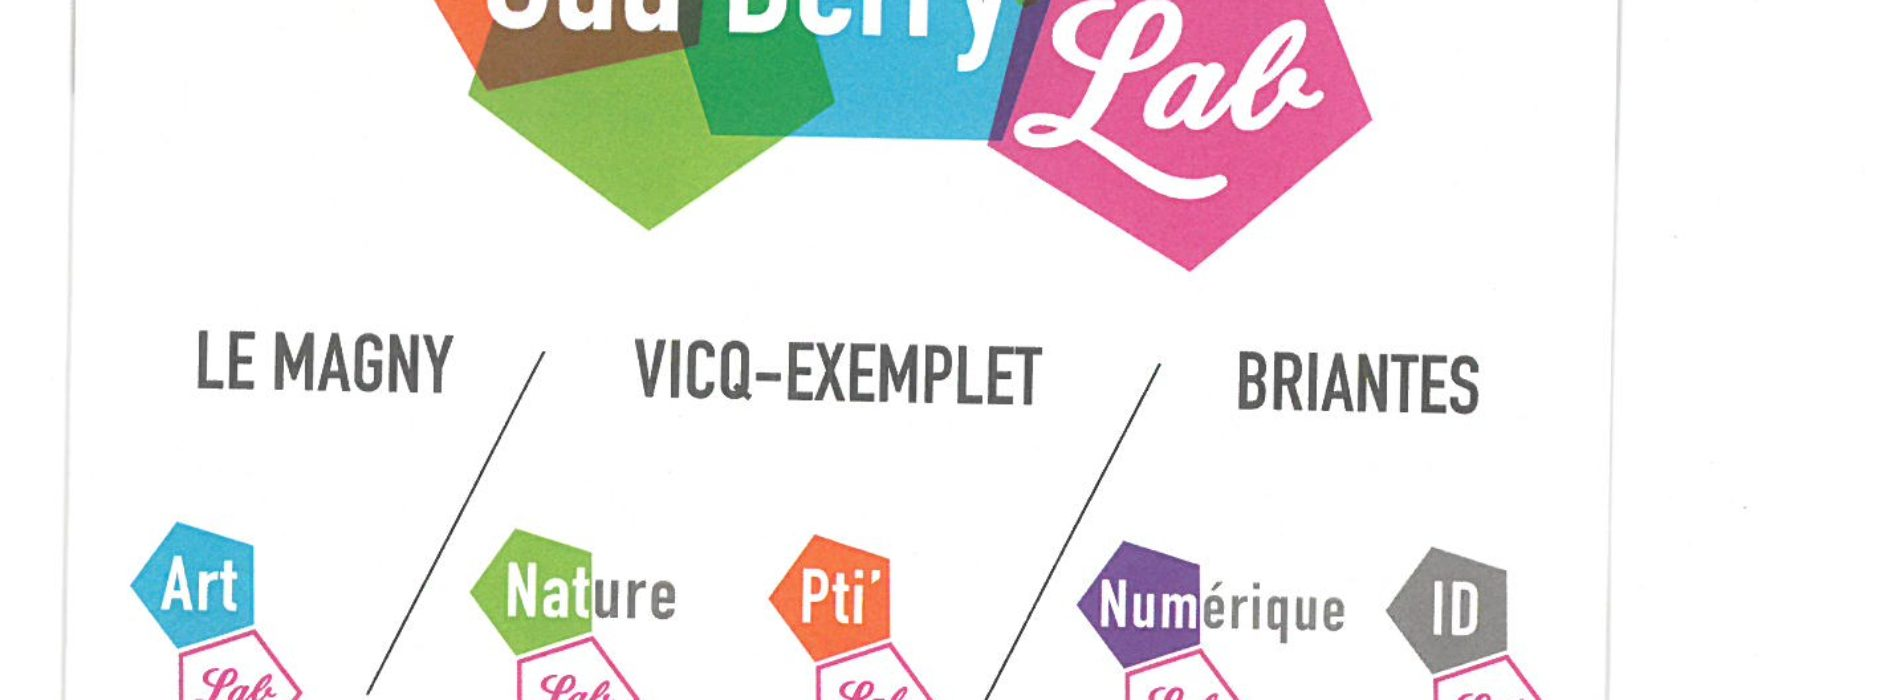 SUD BERRY LAB 'PROGRAMMATION AUTOMNE-HIVER 2020